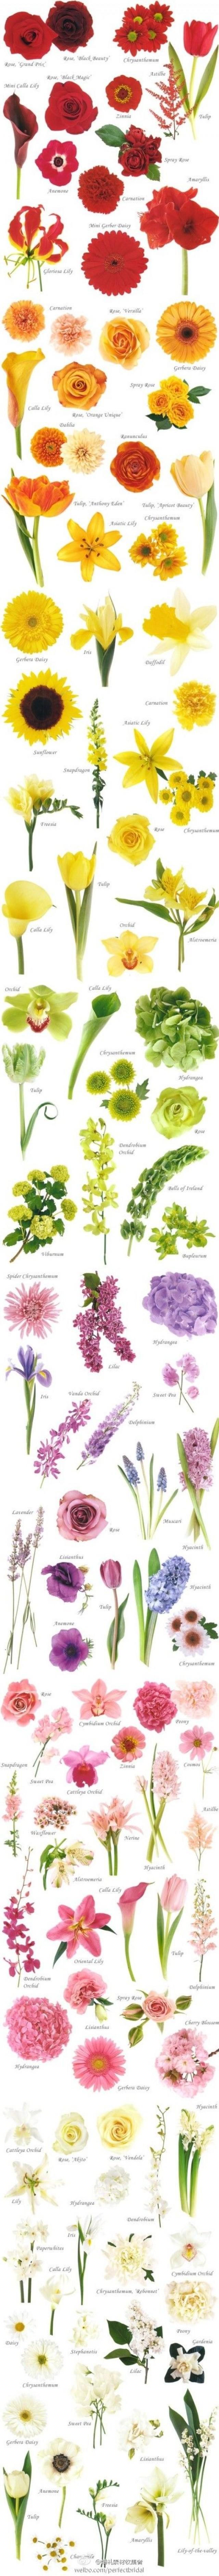 Oriental Wedding Flower Chart 2058004 Weddbook